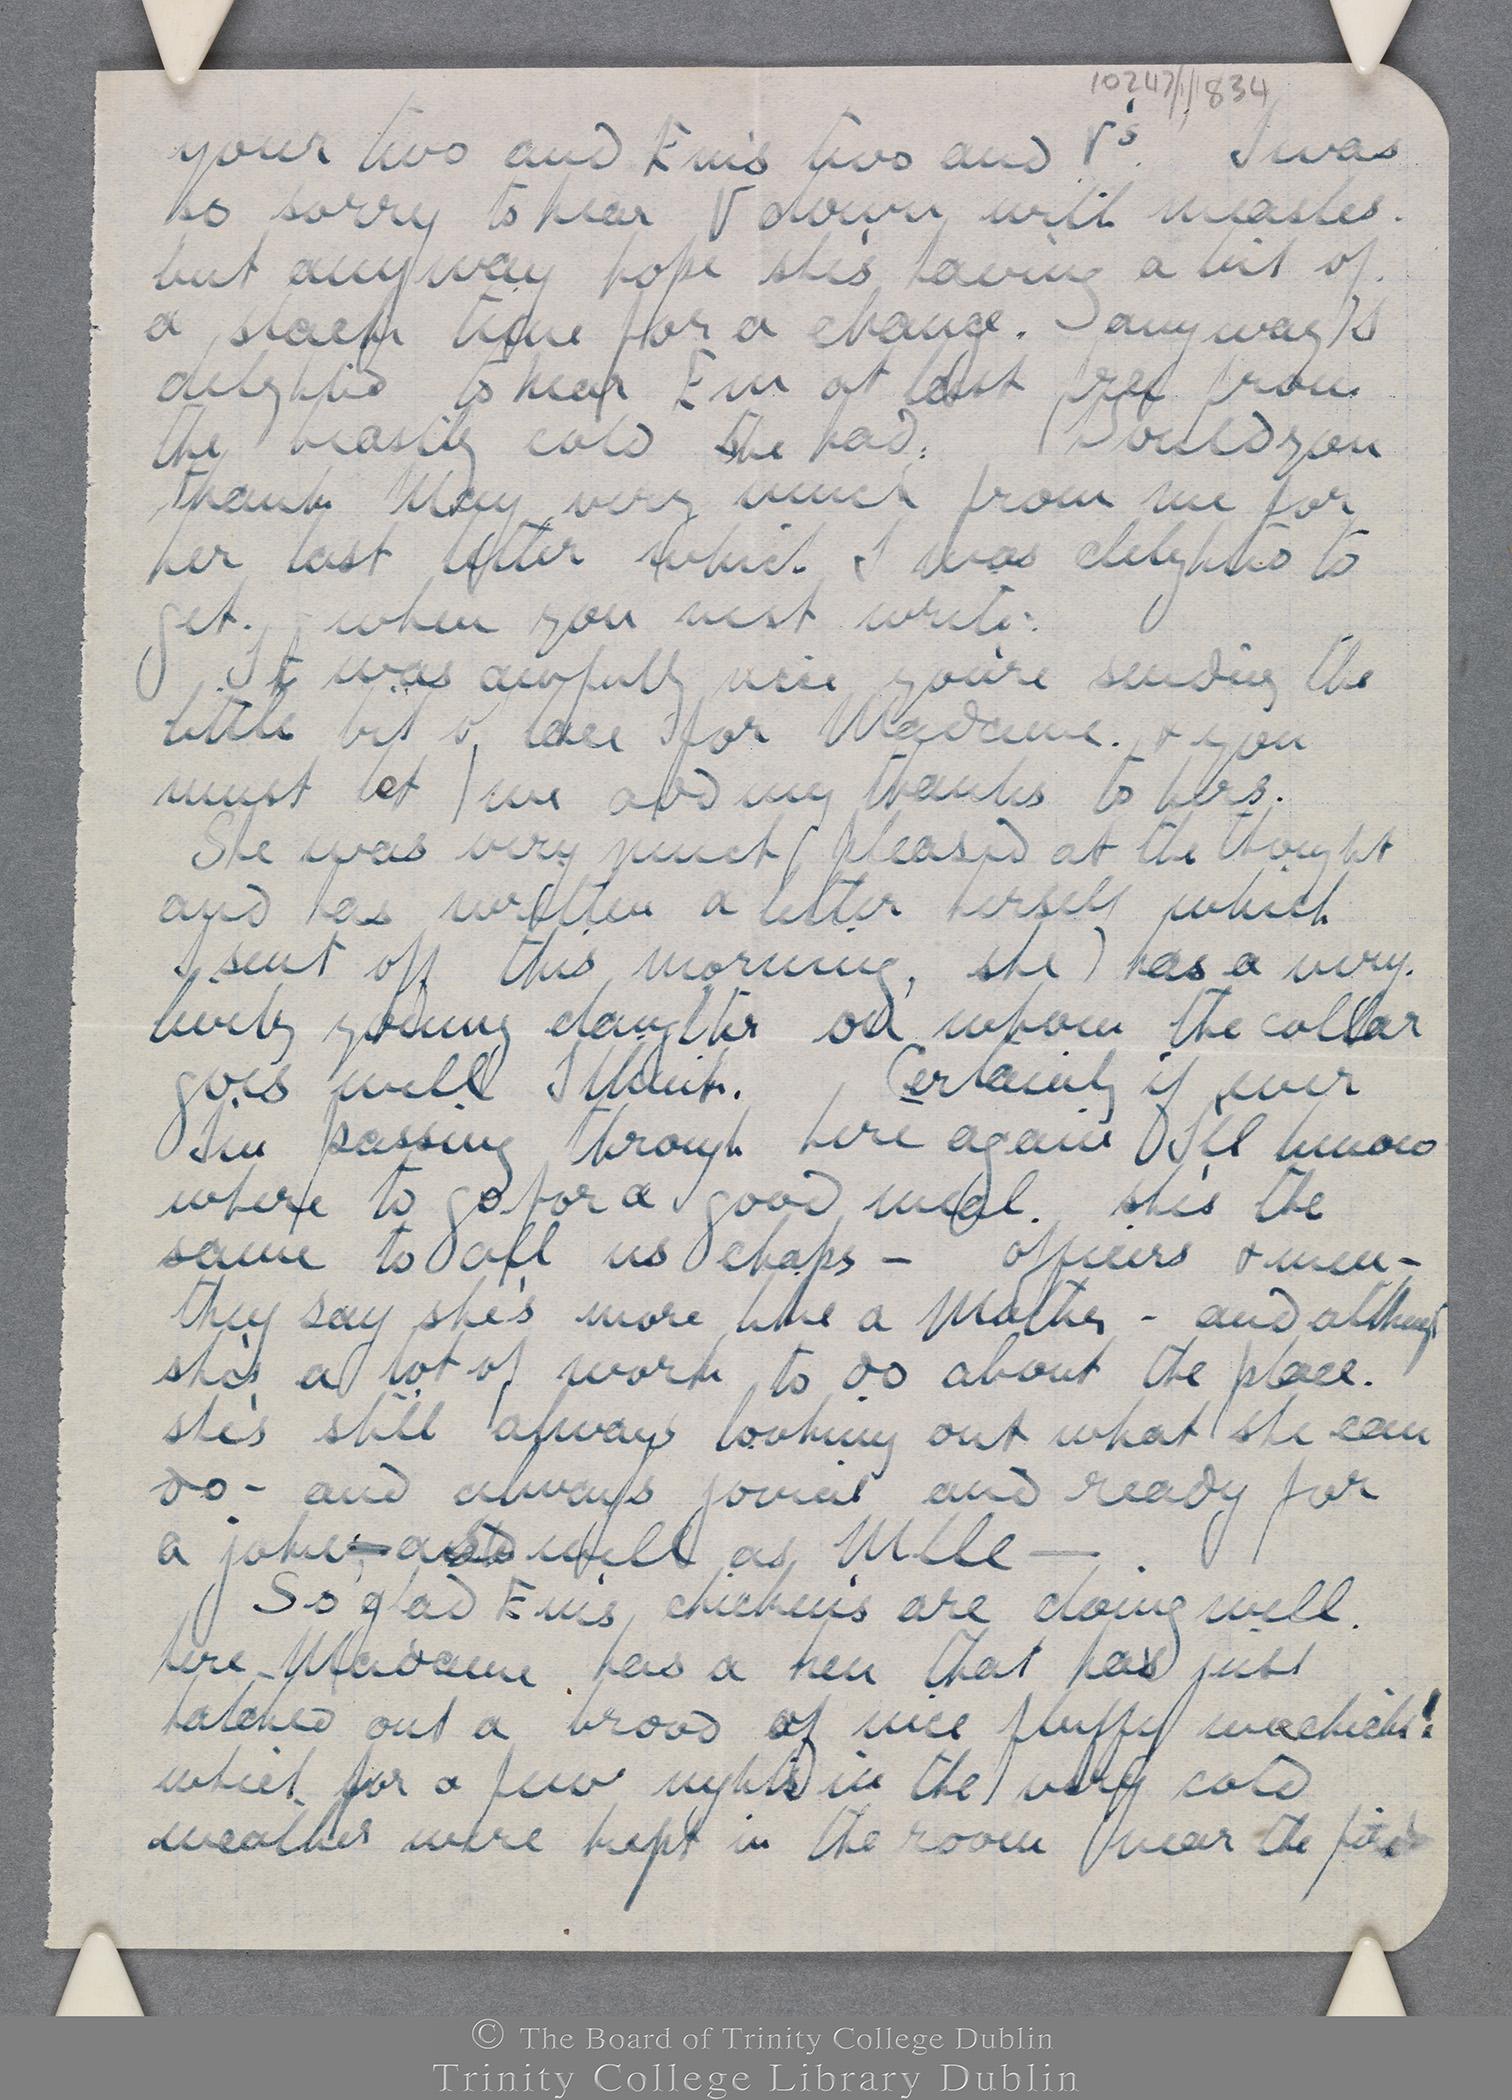 TCD MS 10247/1/834 folio 2 recto